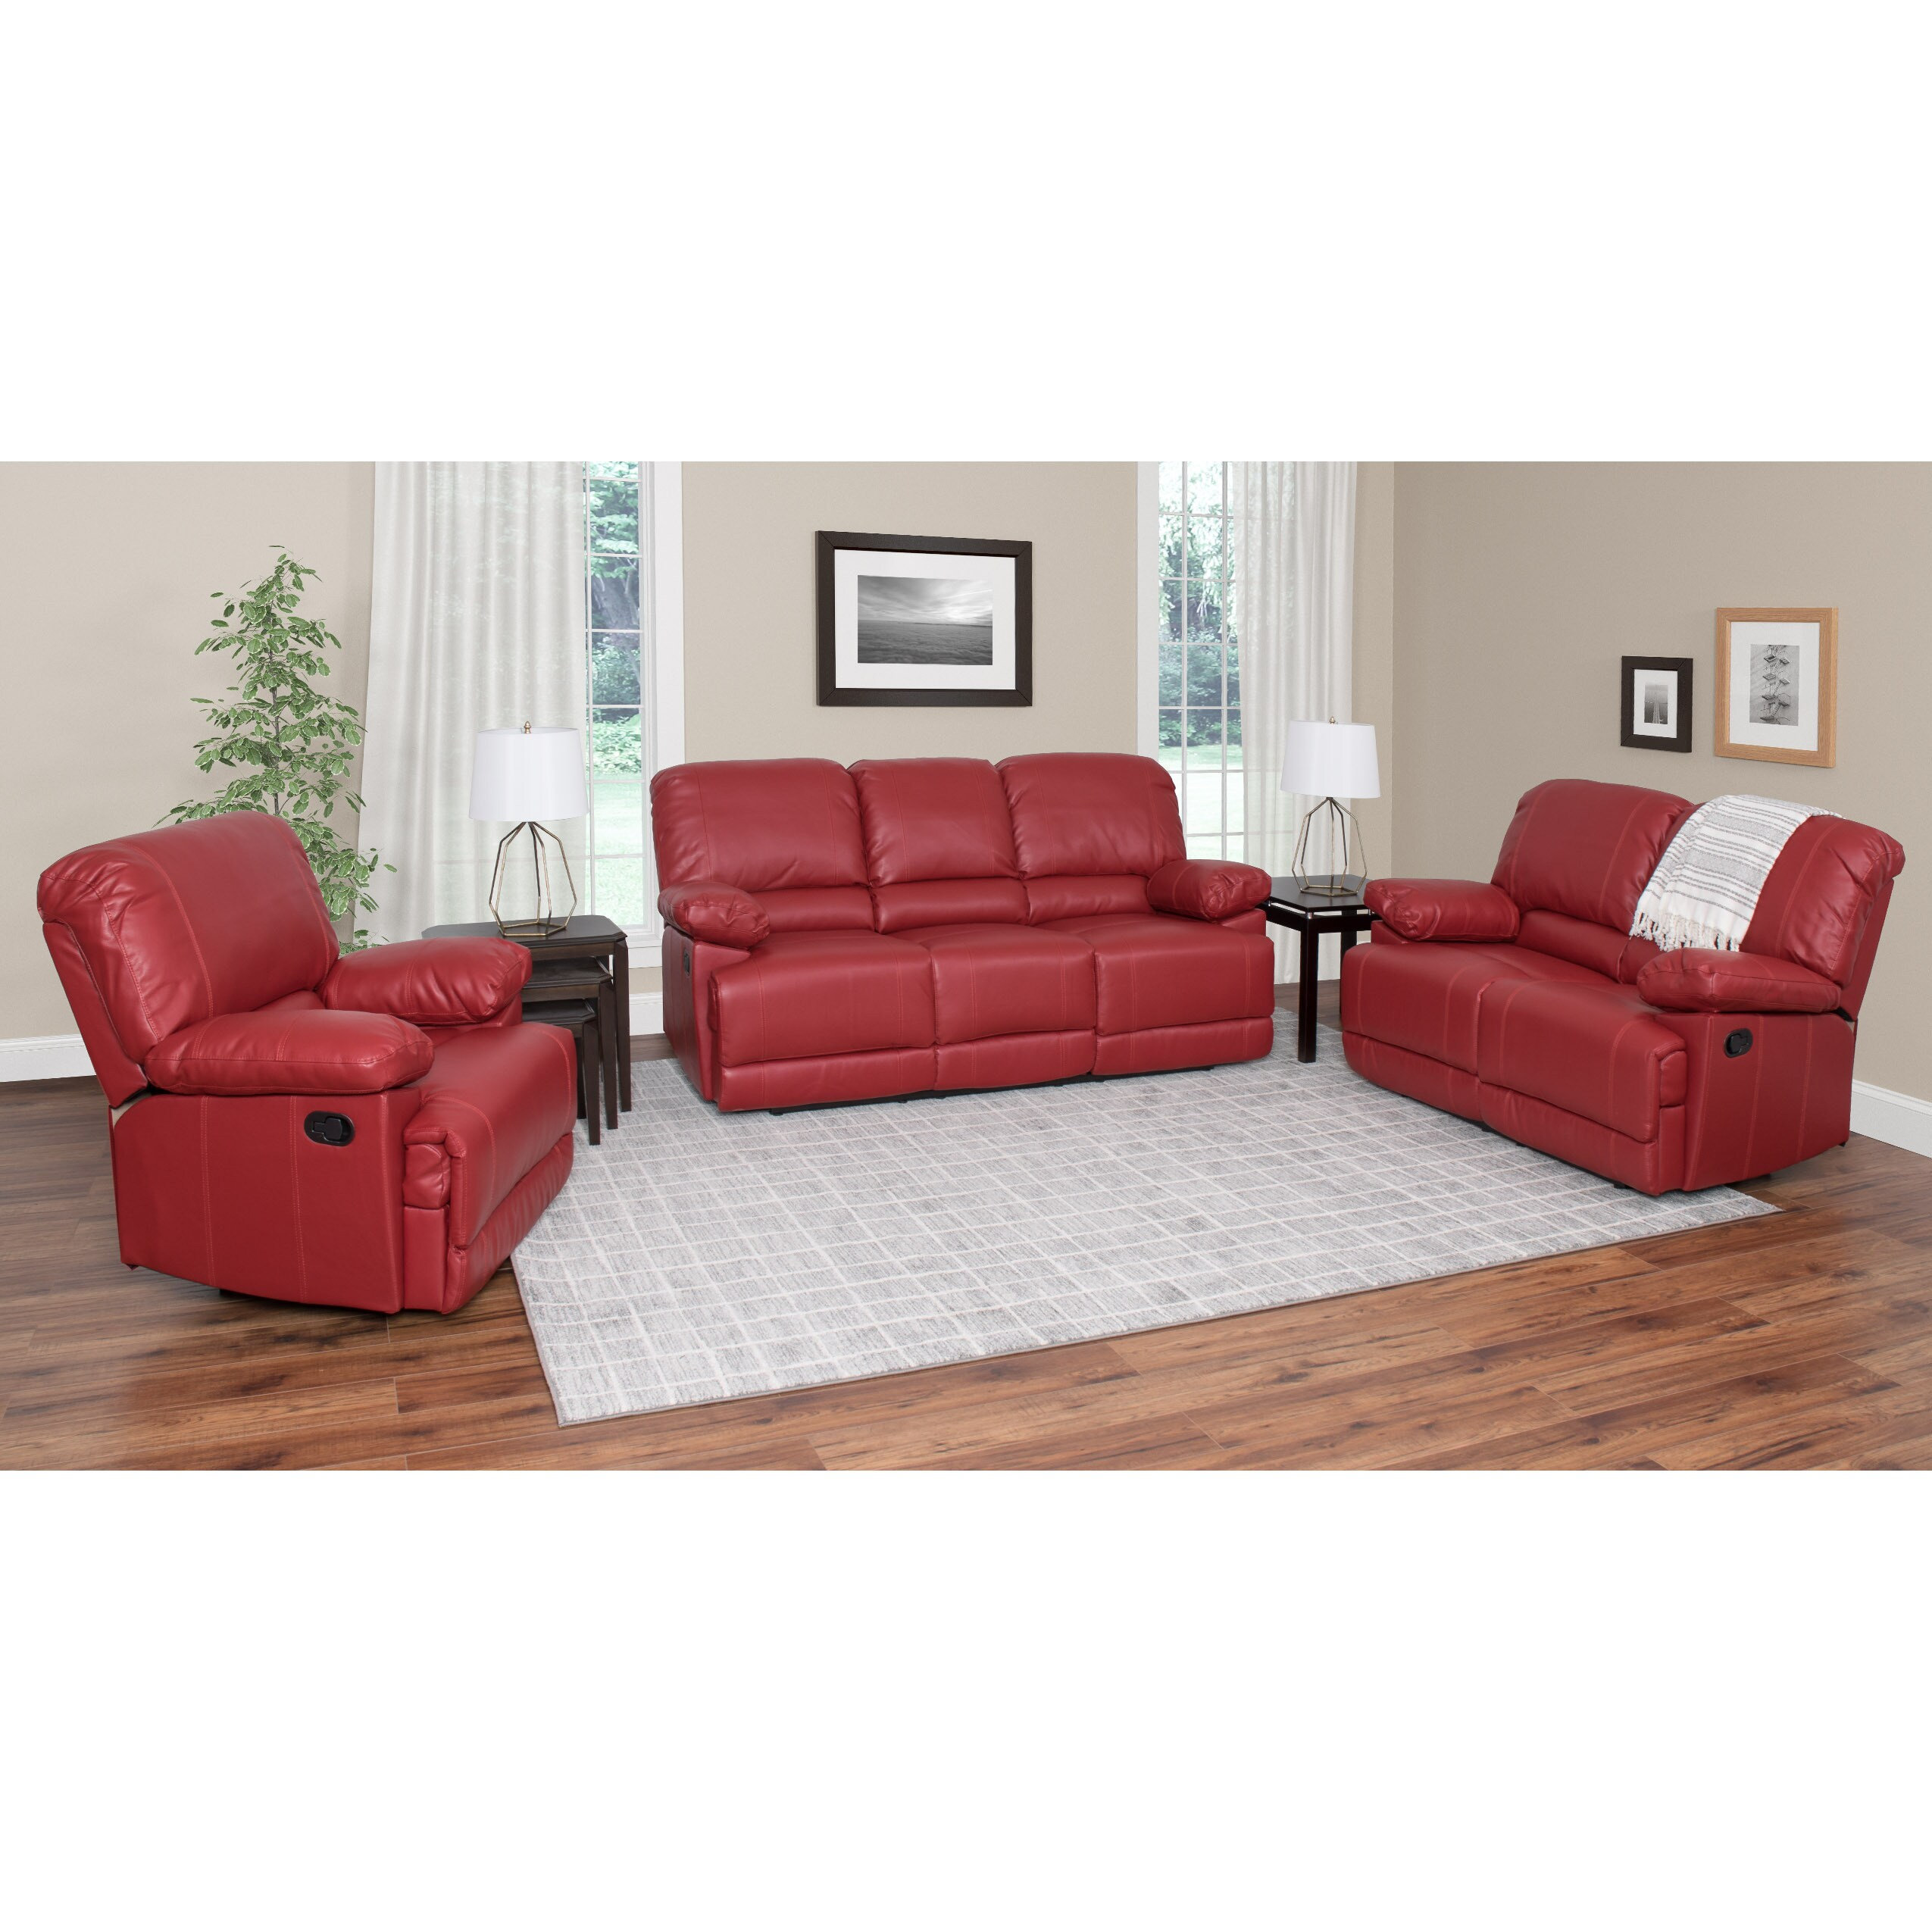 bonded leather reclining sofa set sofas you love santa barbara ca corliving lea 3 piece ebay